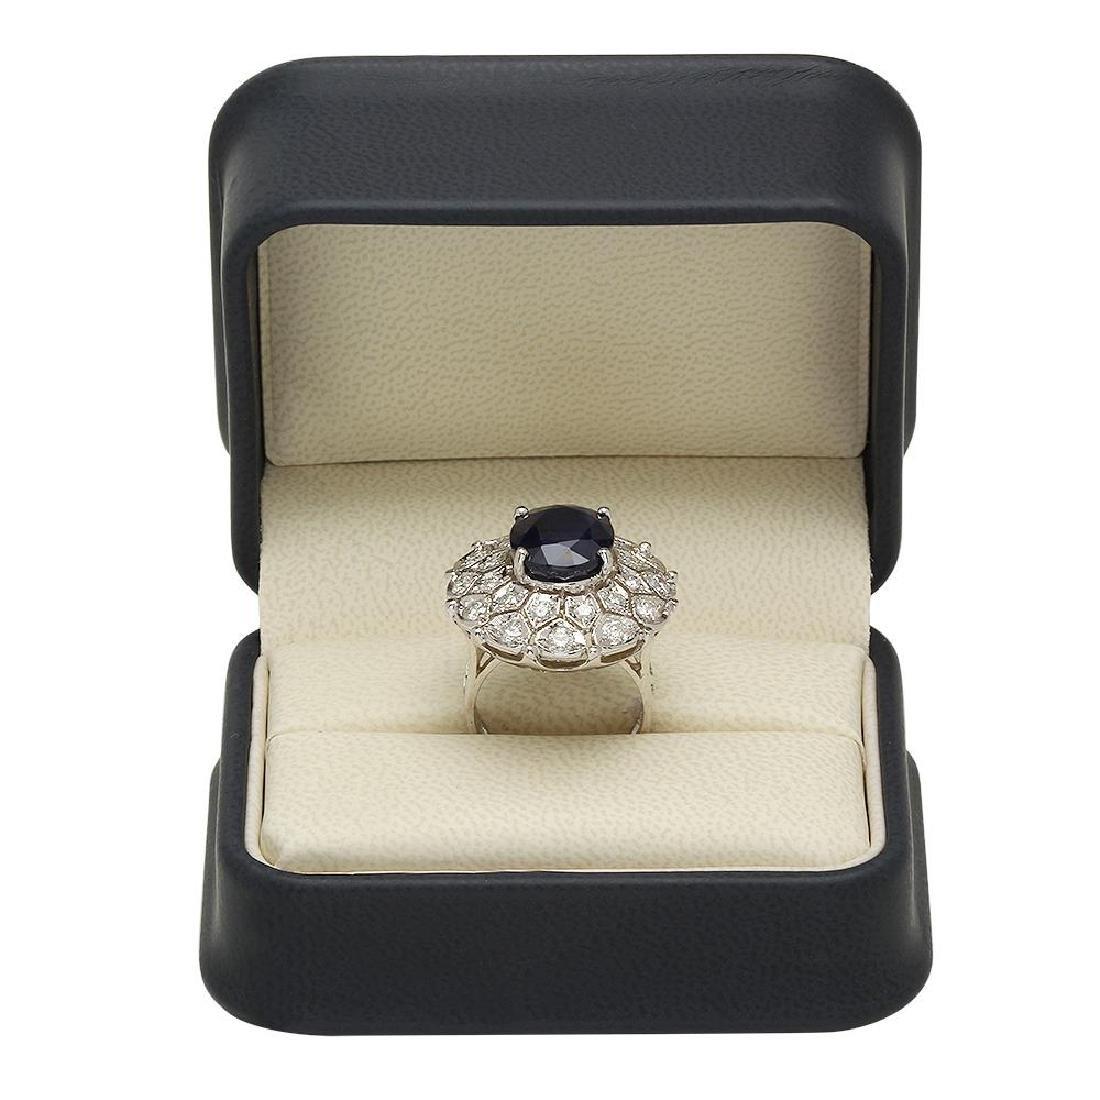 14K Gold 9.23ct Sapphire 1.72ct Diamond Ring - 4